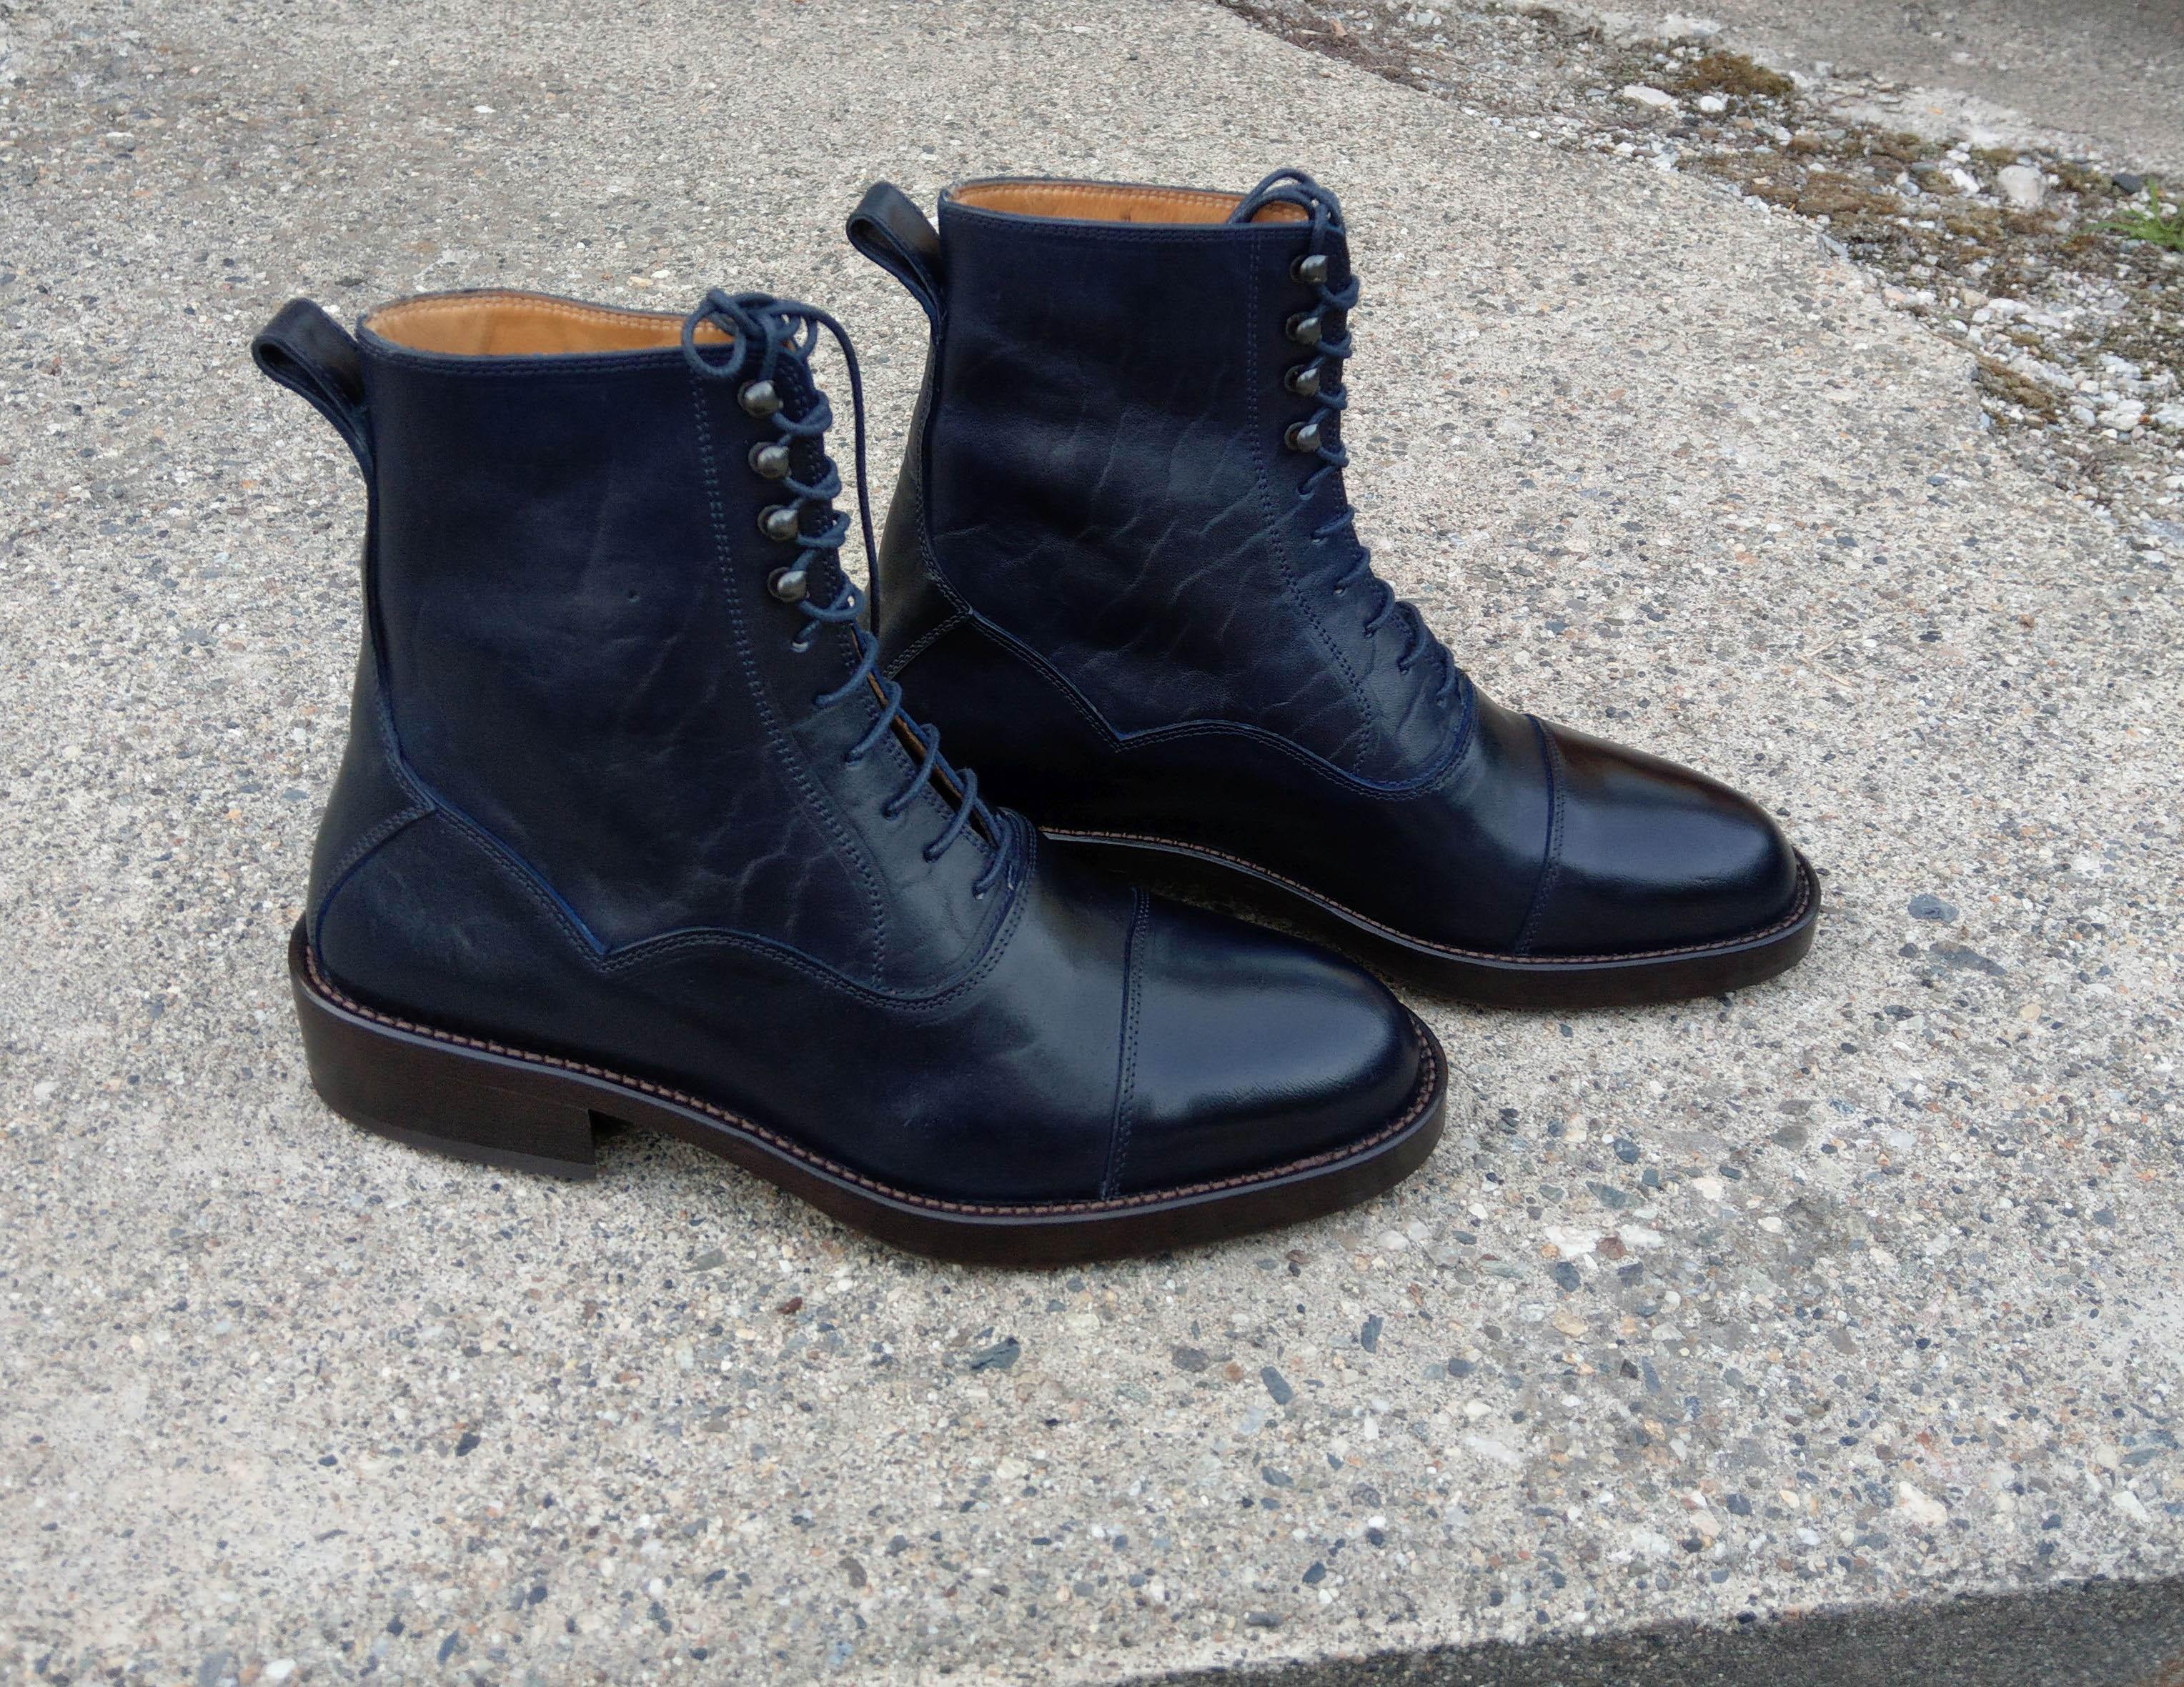 Navy-Horsehide-Balmoral-Boots-009.jpg